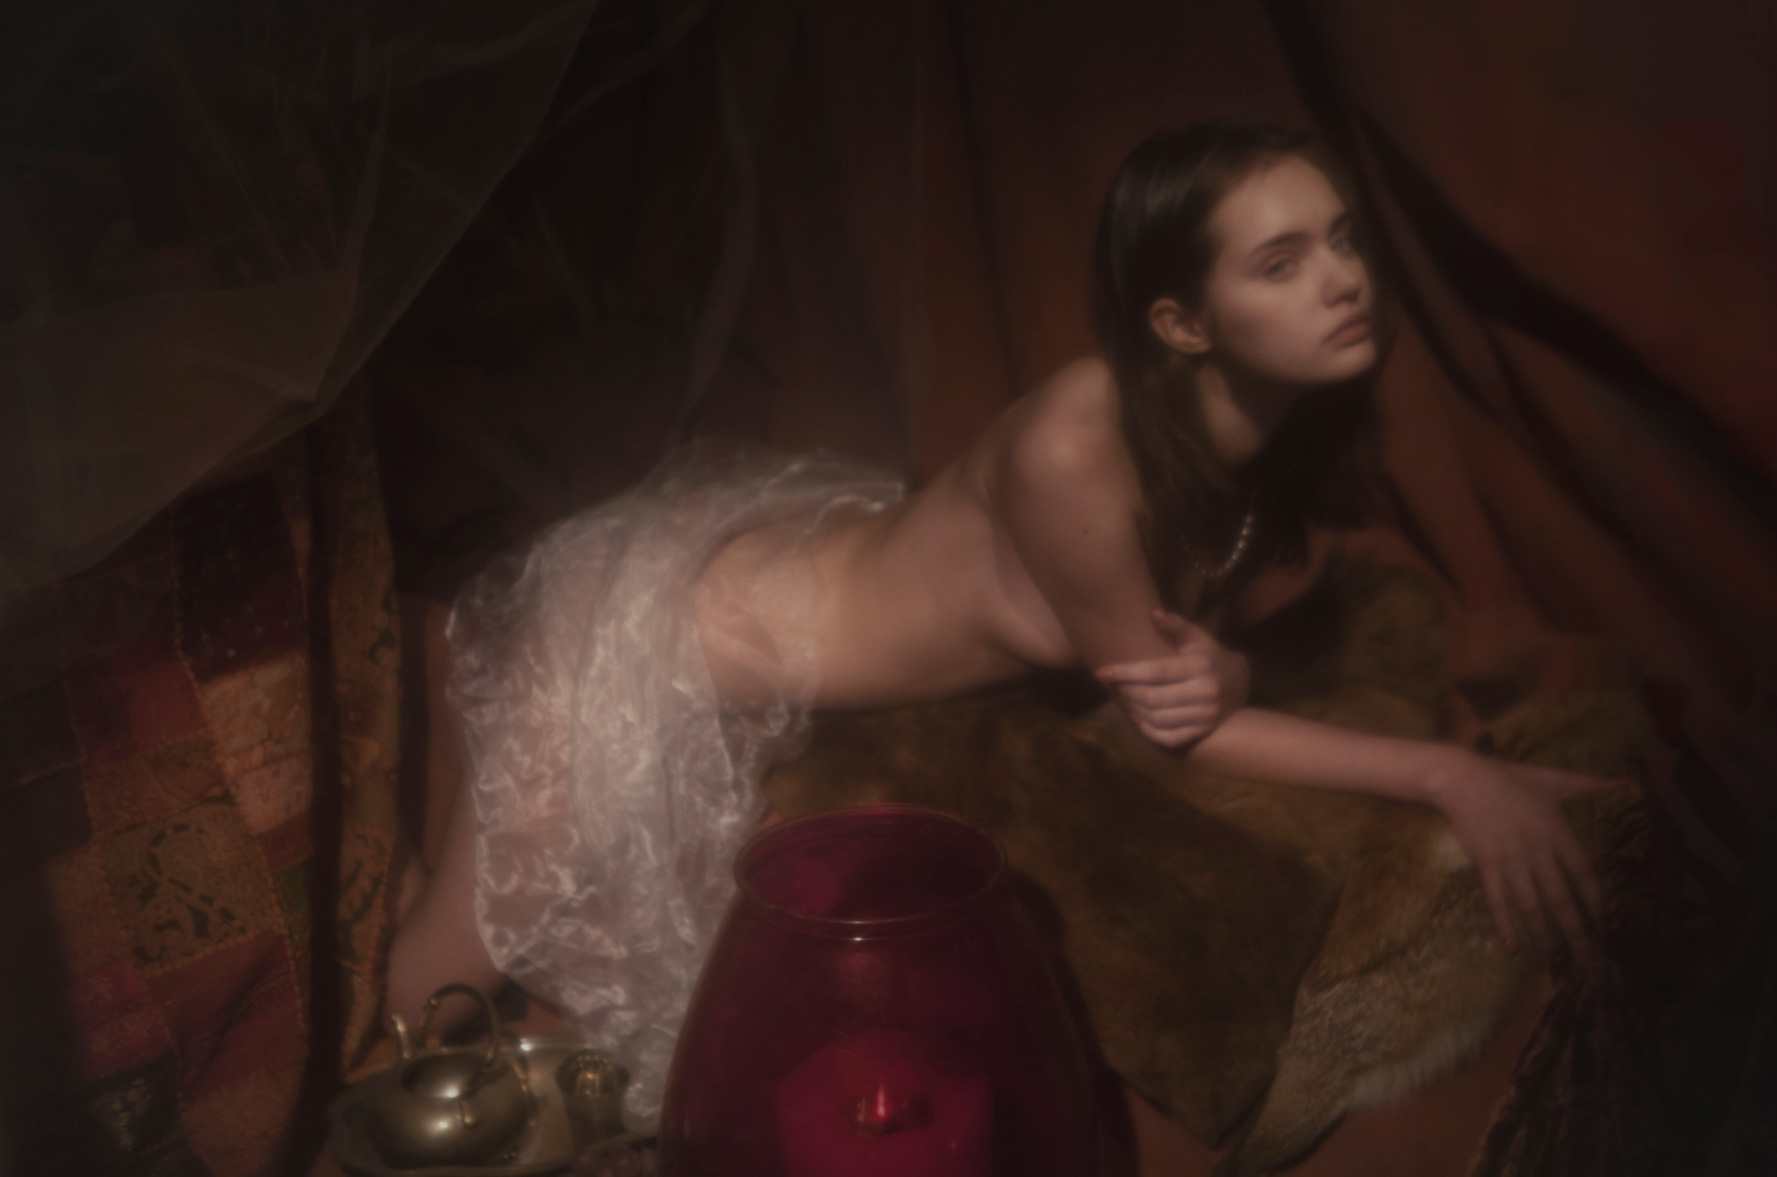 -Одалиска- Ольга Збитковская / Olga Zbitkovskaja by Nil Hoppenot / The Ones 2 Watch